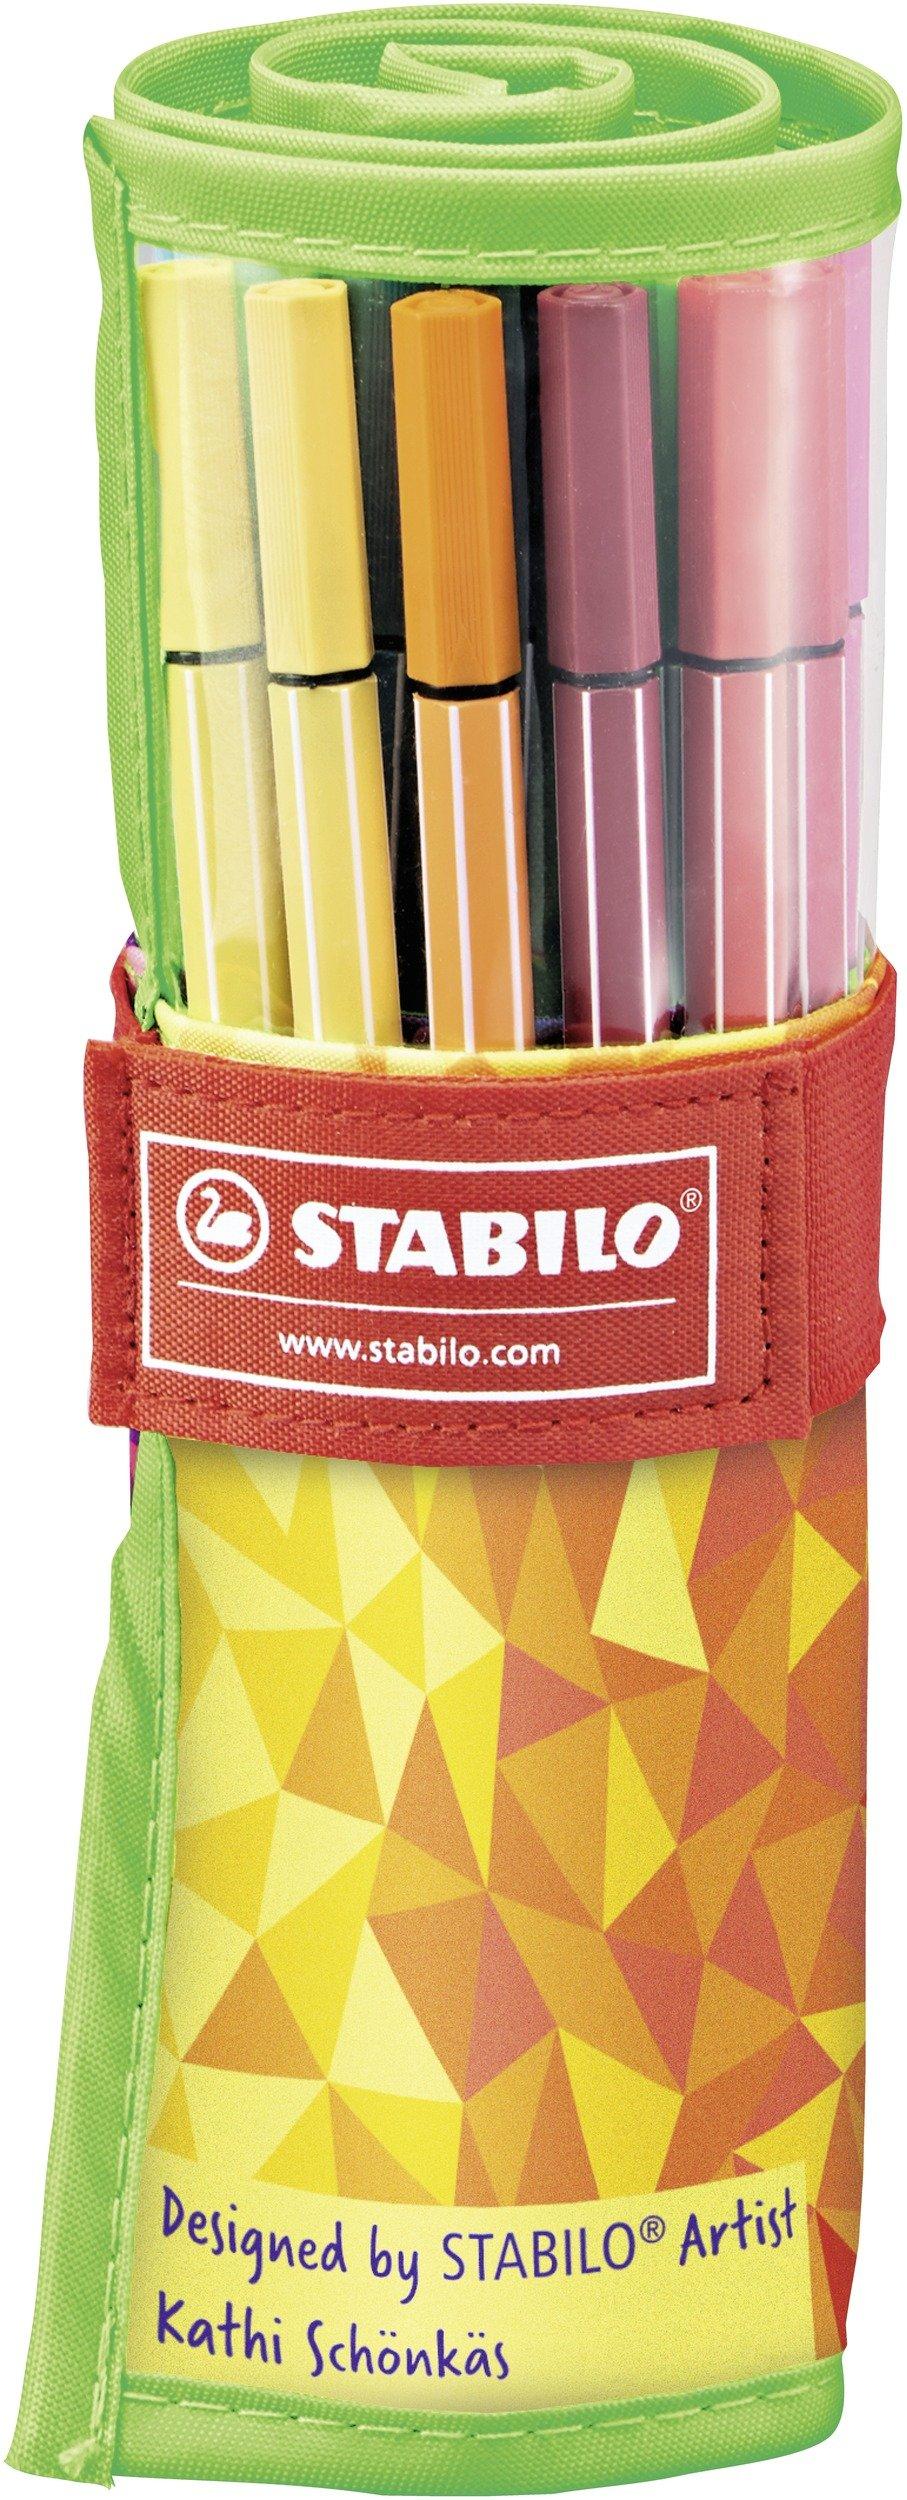 Rotulador STABILO Pen 68 – Estuche premium de tela Rollerset  Fan Edition con 25 colores